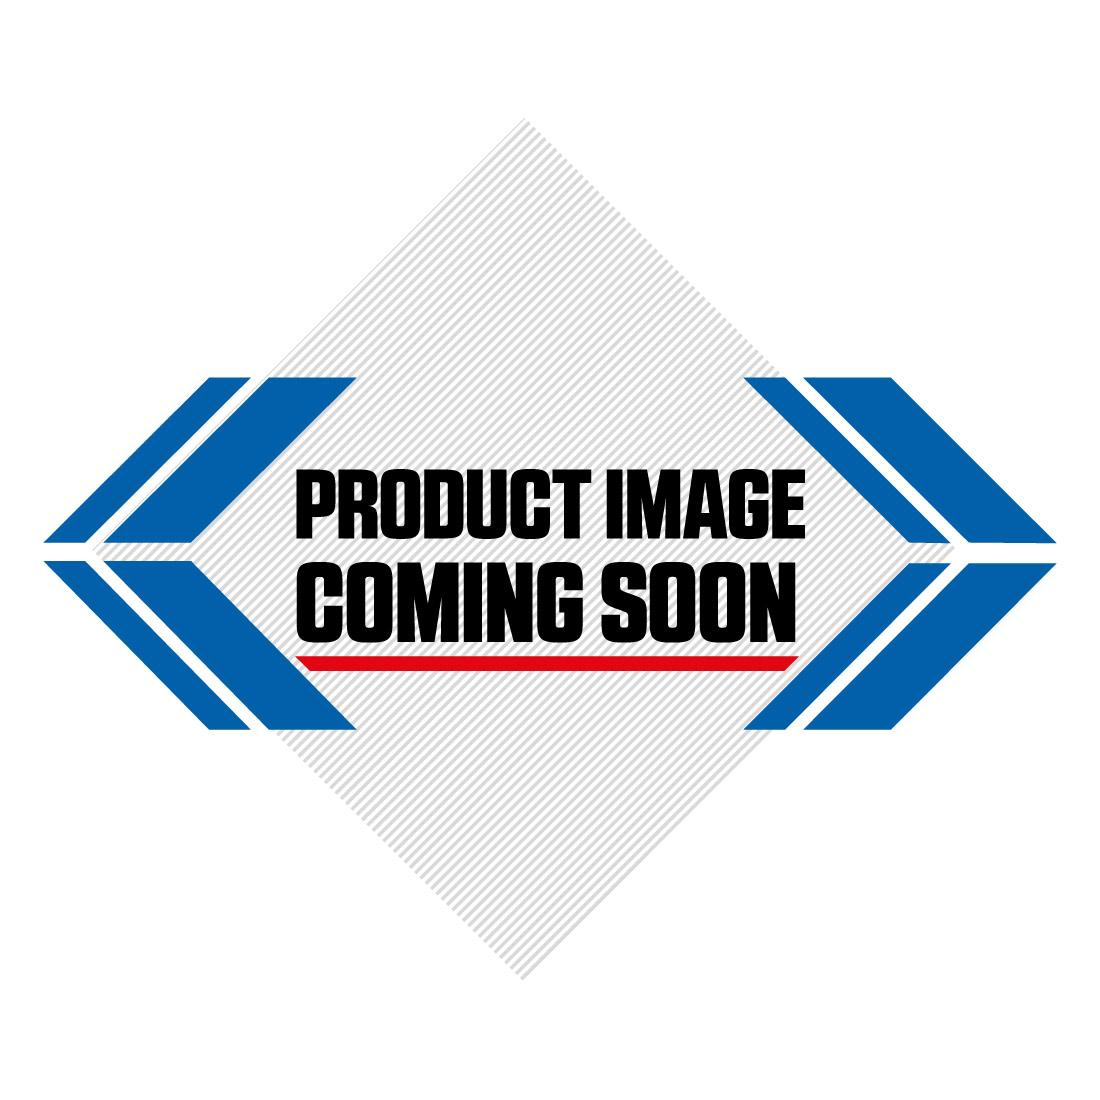 Sidi Black Ash Crossfire 3 SRS MX Boots Image-1